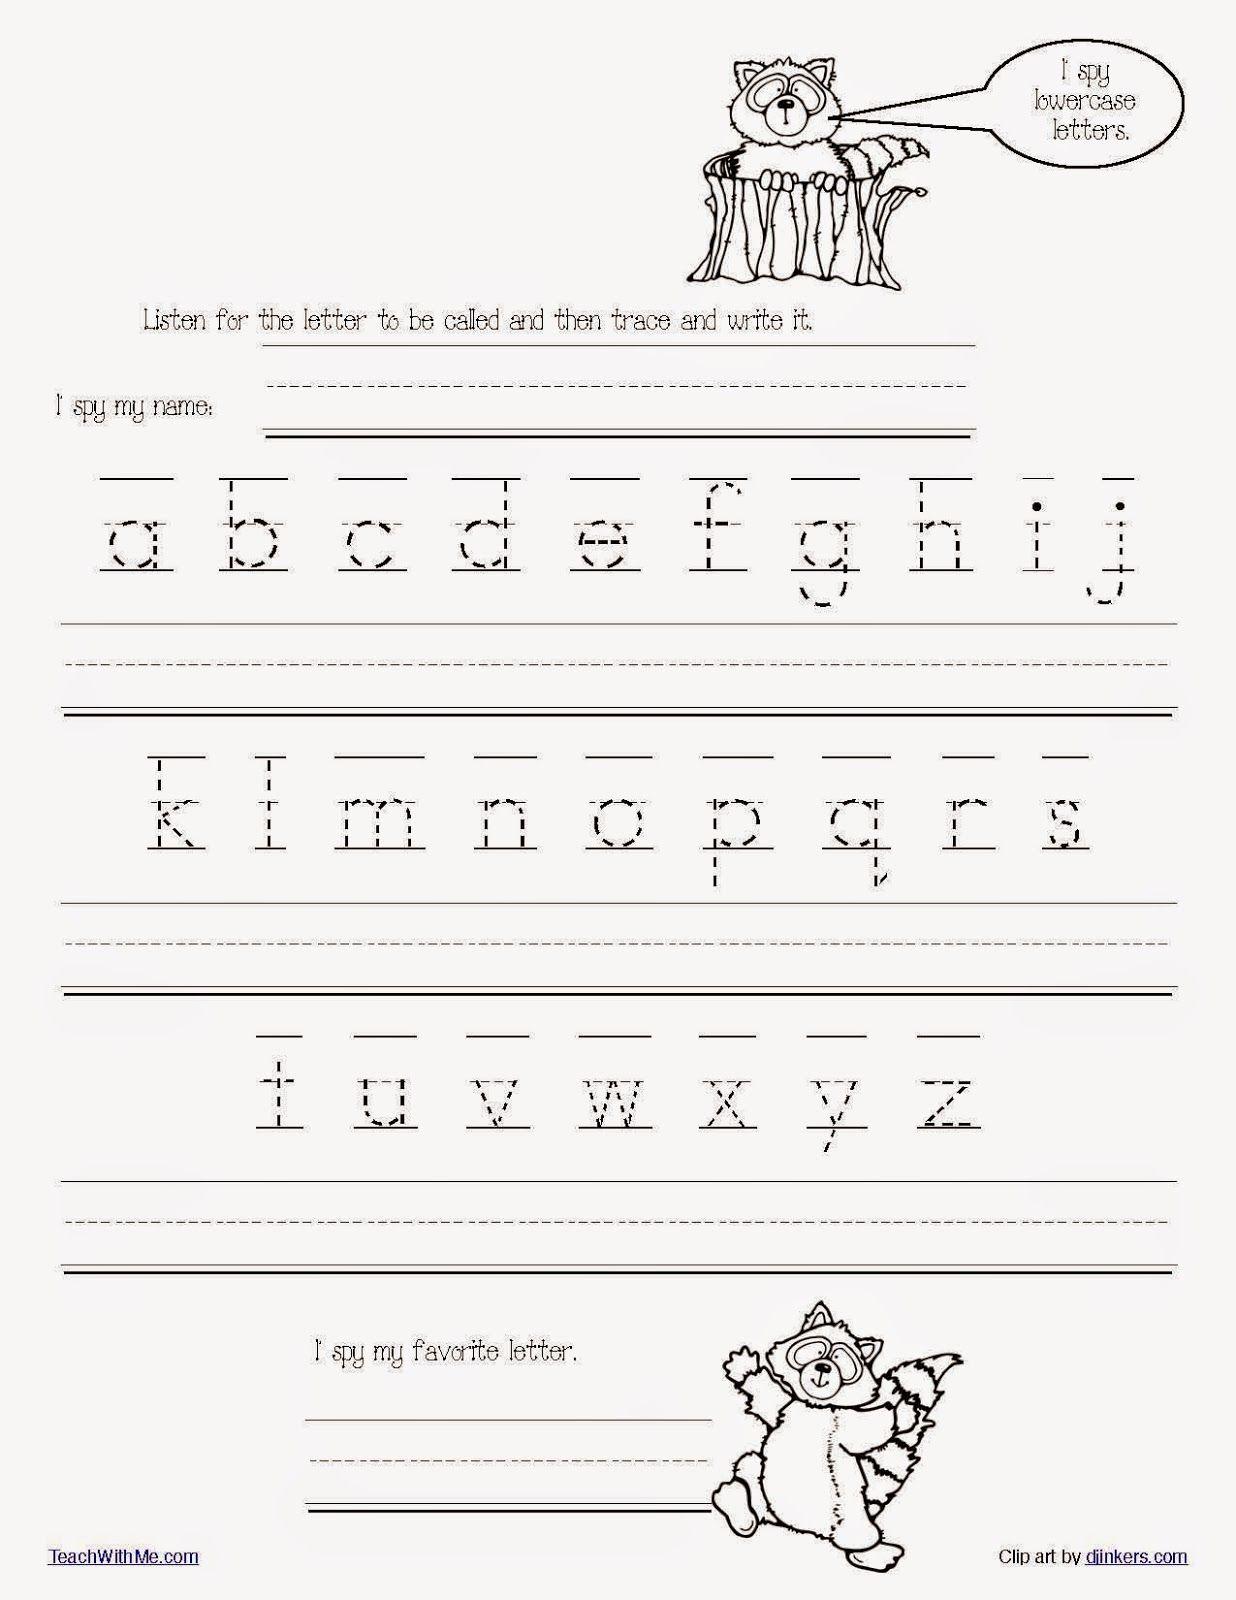 The Kissing Hand Alphabet Games Packet Handwriting Worksheets For Kindergarten Free Handwriting Worksheets Handwriting Worksheets Free kindergarten handwriting worksheets